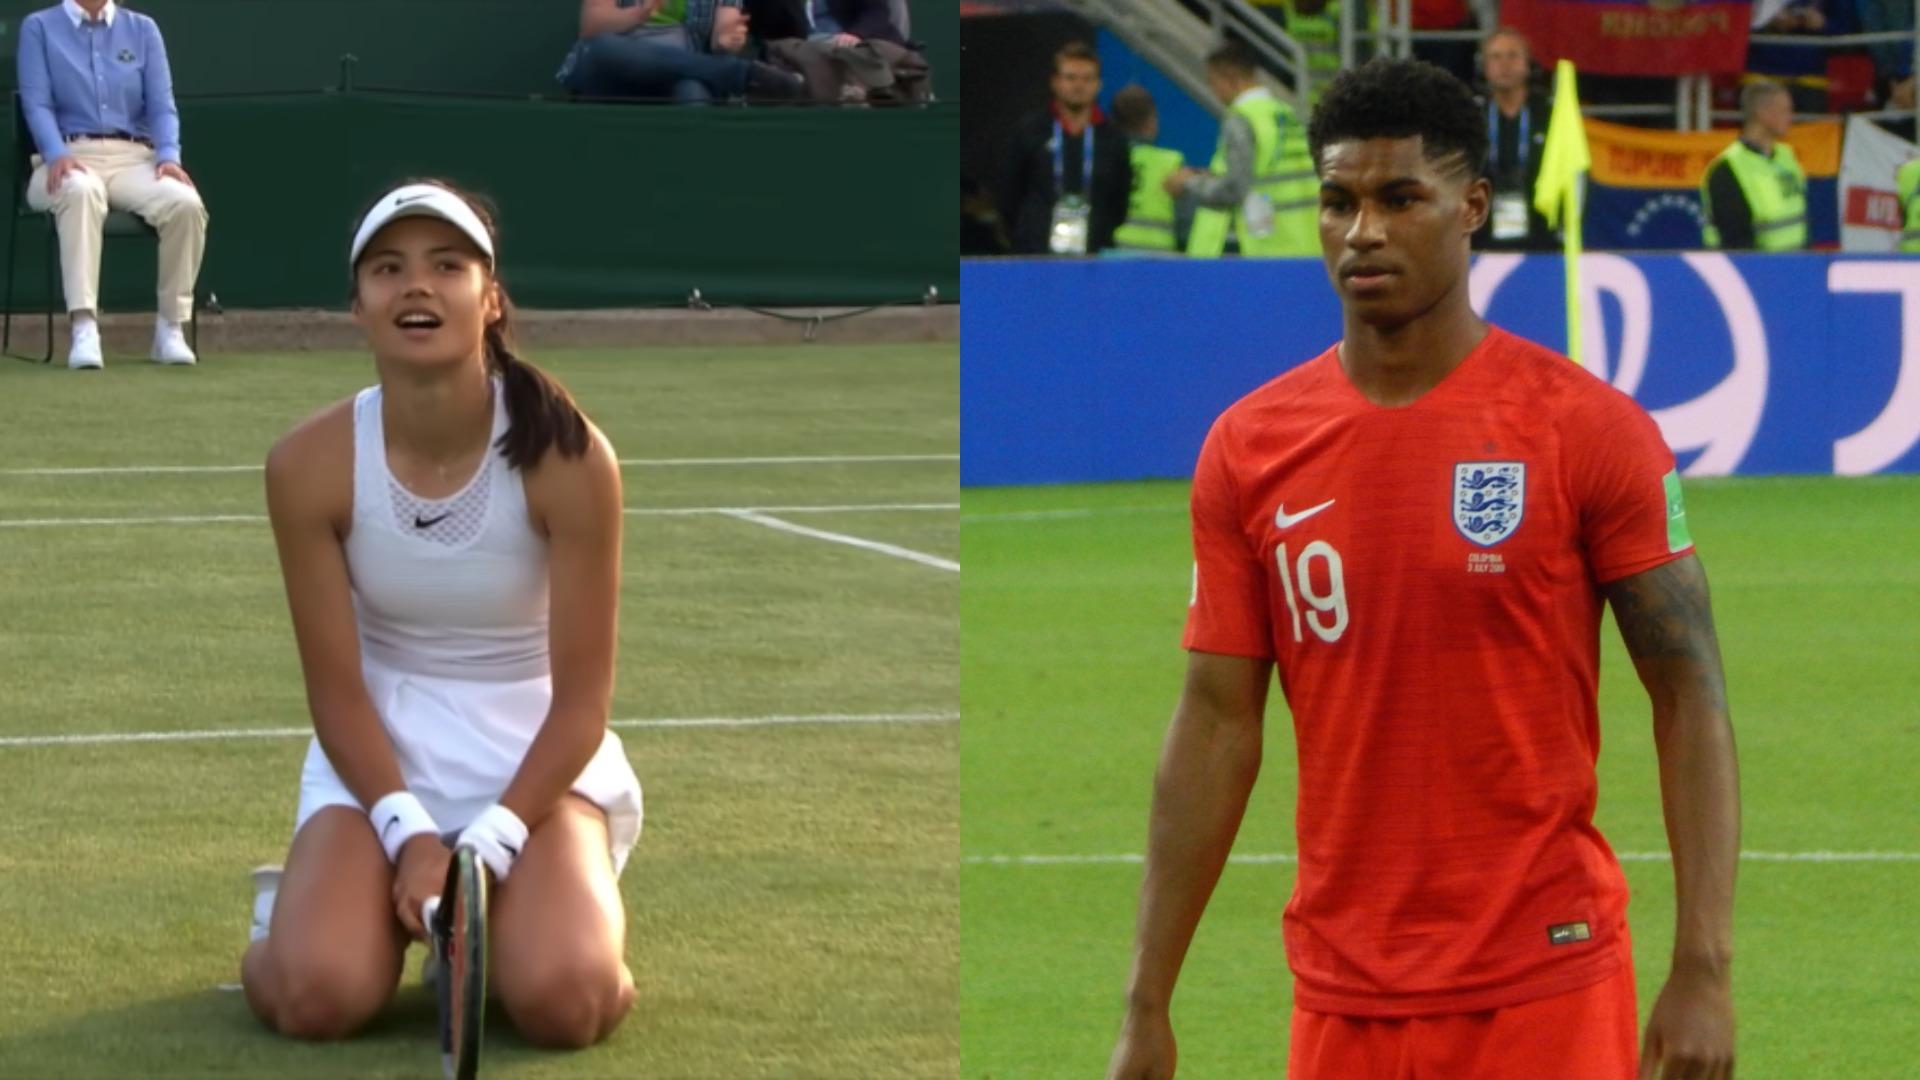 Emma Raducanu 'extremely grateful' for Marcus Rashford following Wimbledon exit - Resonate